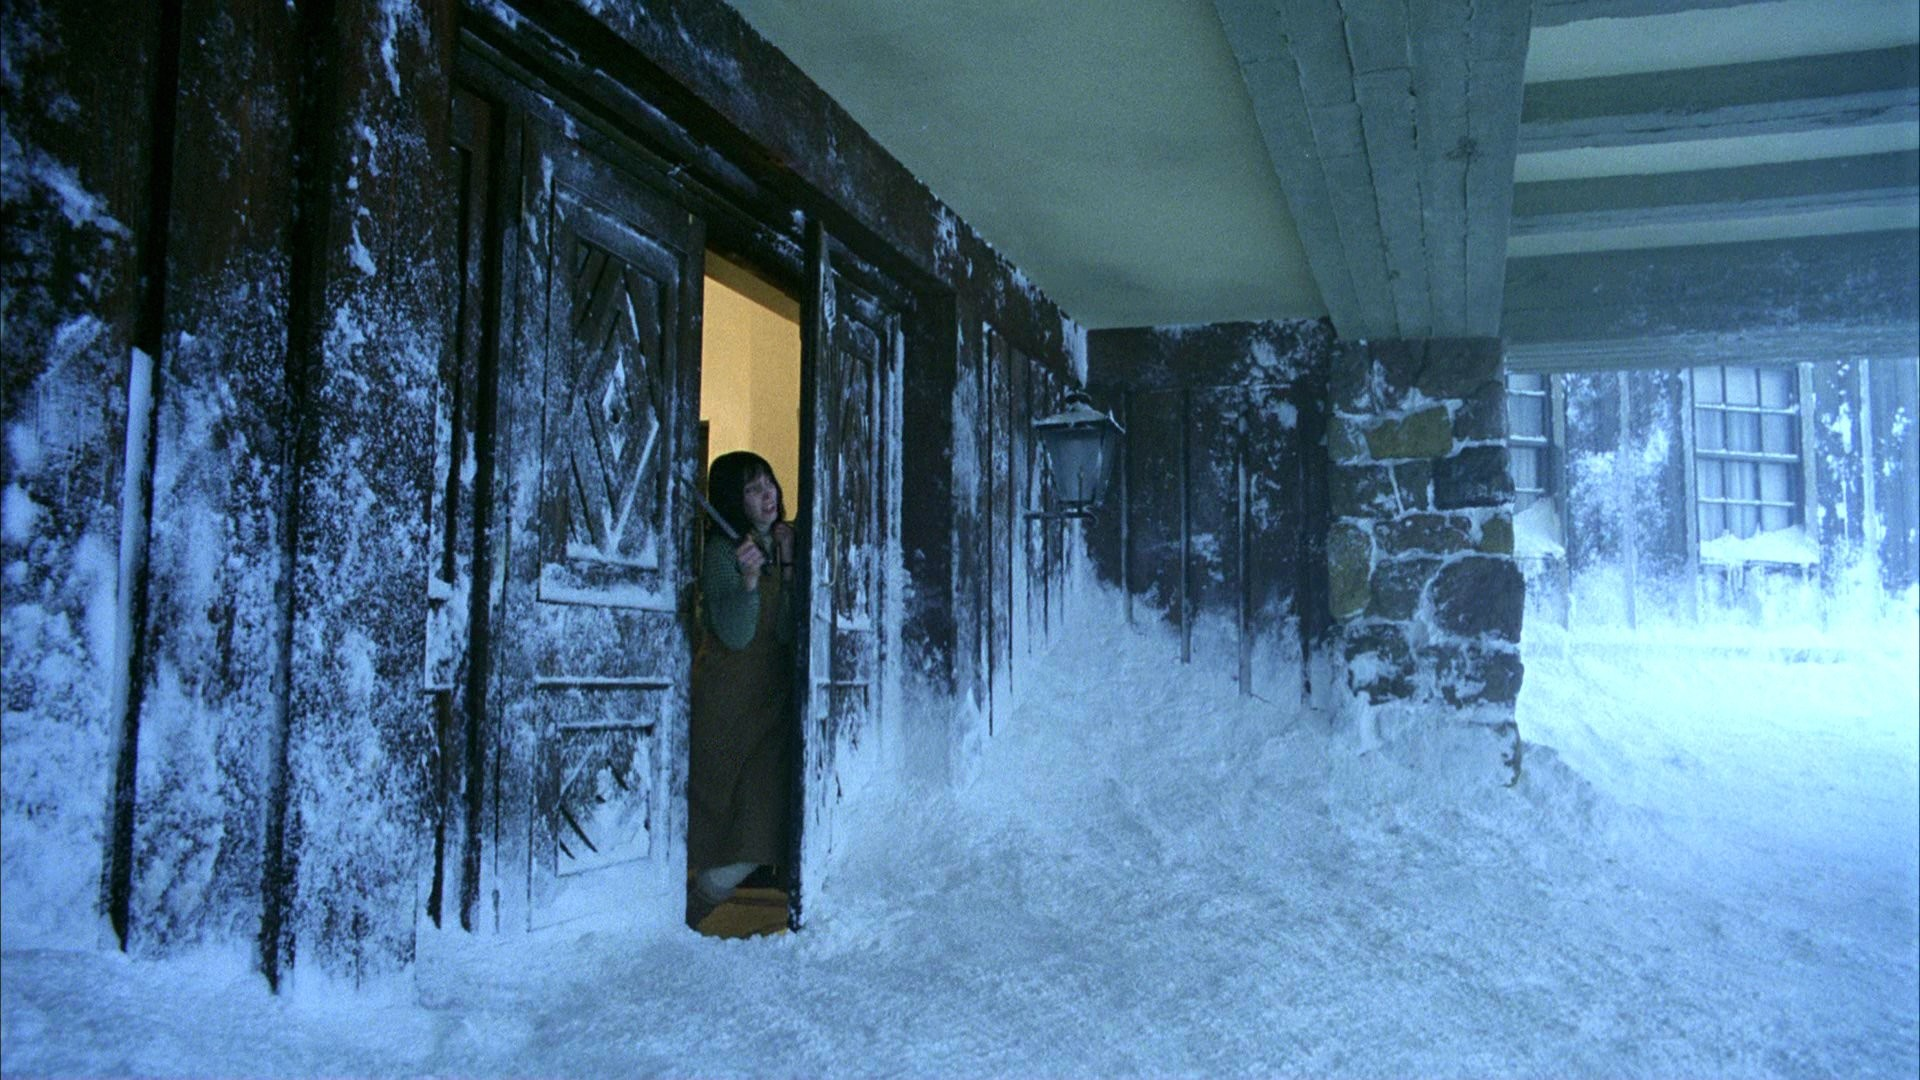 THE SHINING horror thriller dark movie film classic wallpaper | |  253400 | WallpaperUP